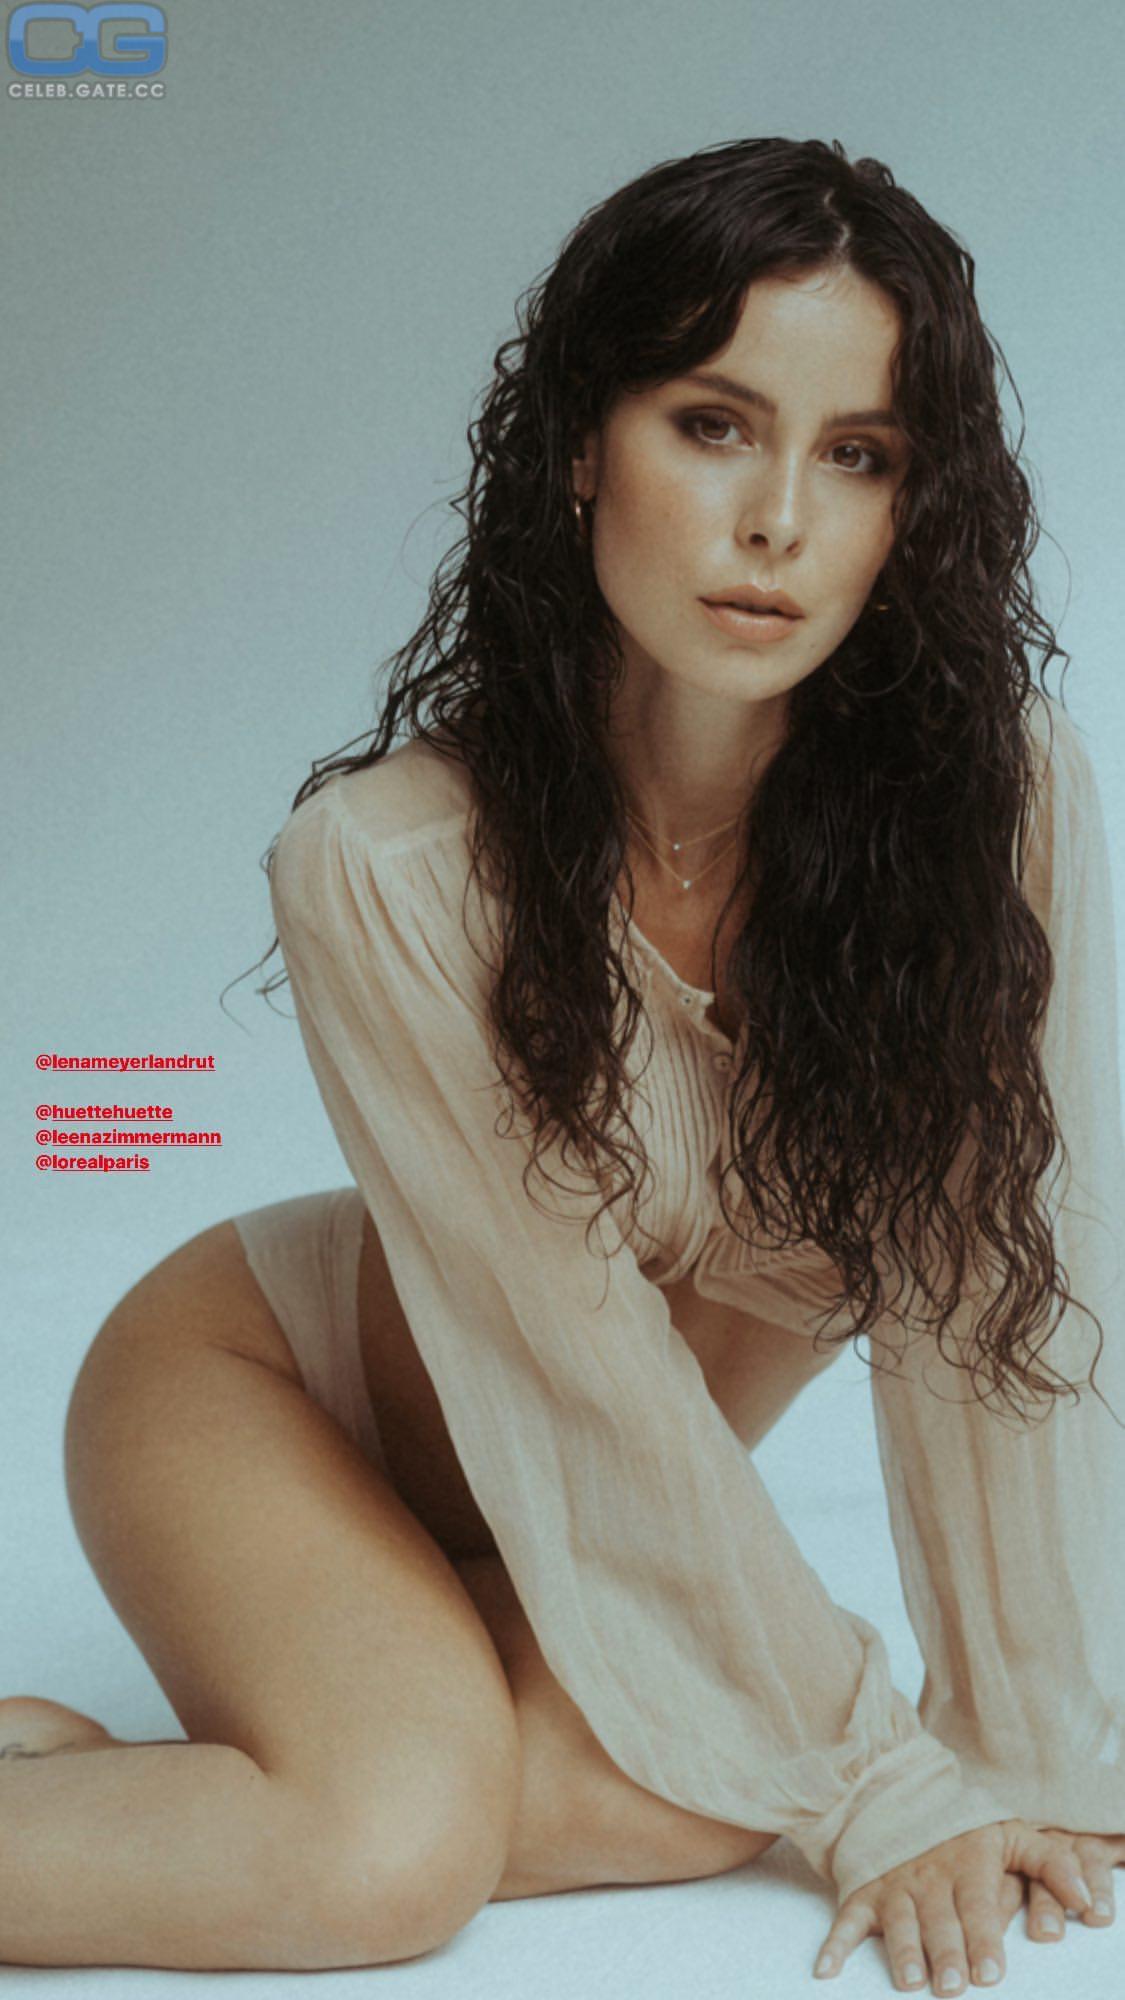 nackt Meyer-Landrut Lena 41 Sexiest